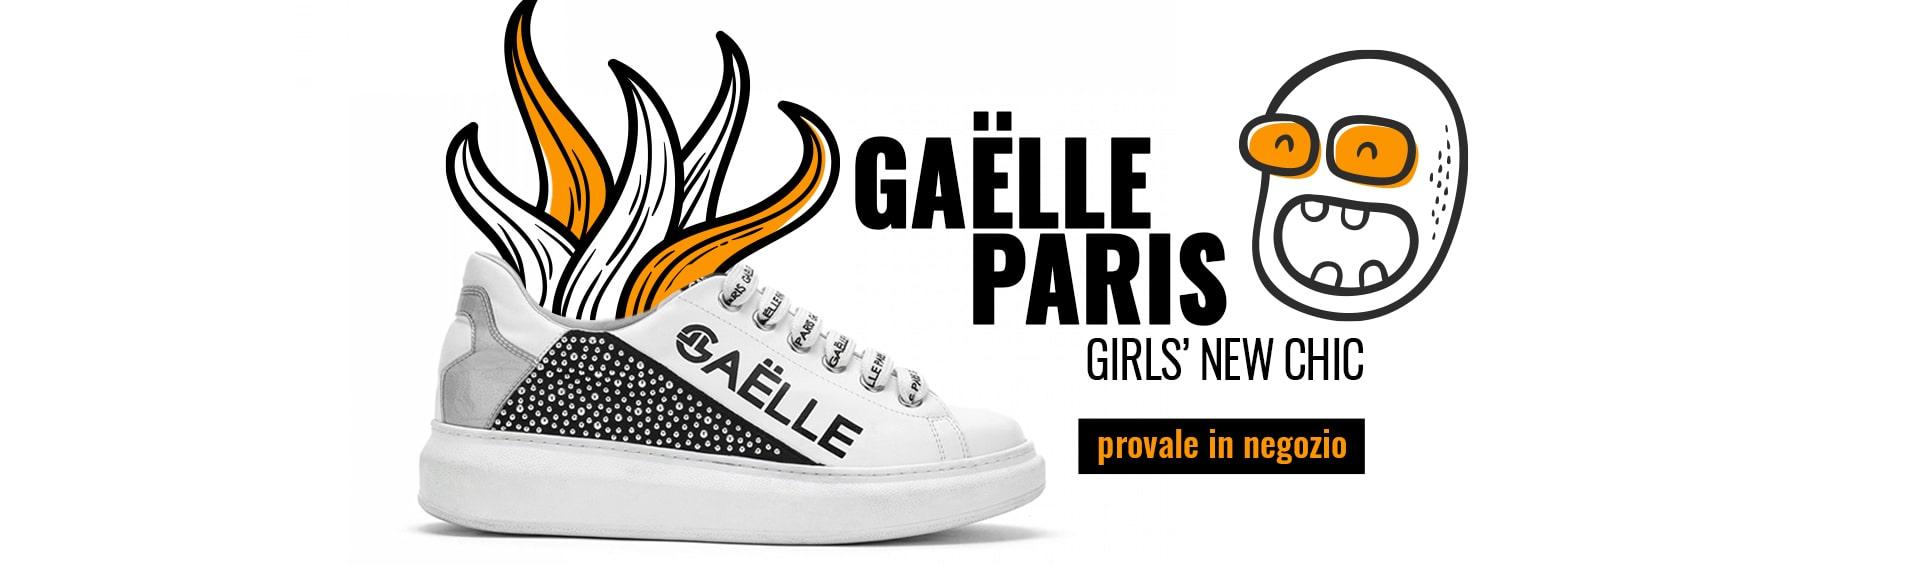 Gaelle-paris-collezione-2021